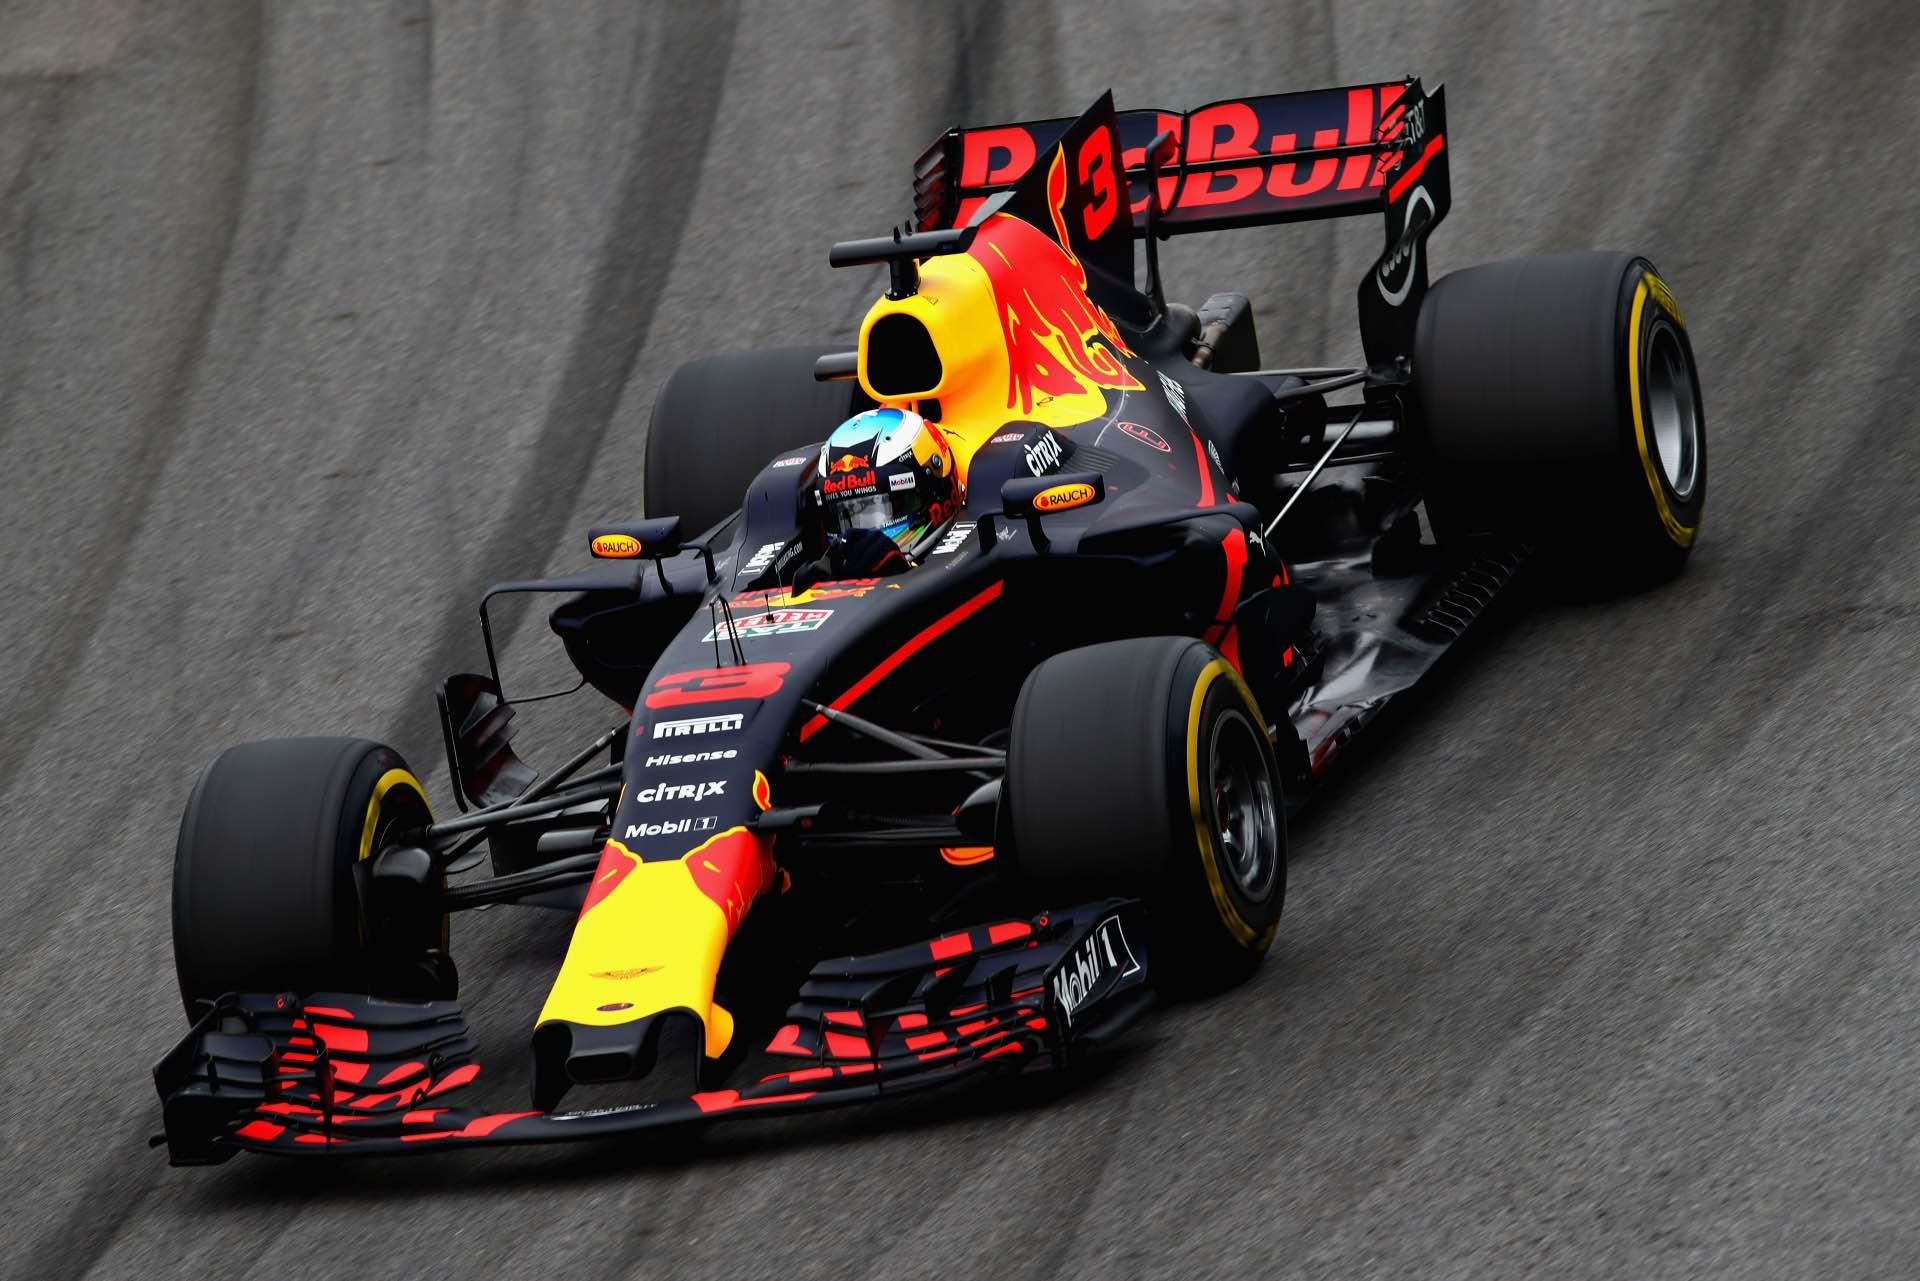 F1 Grand Prix of Brazil - Qualifying